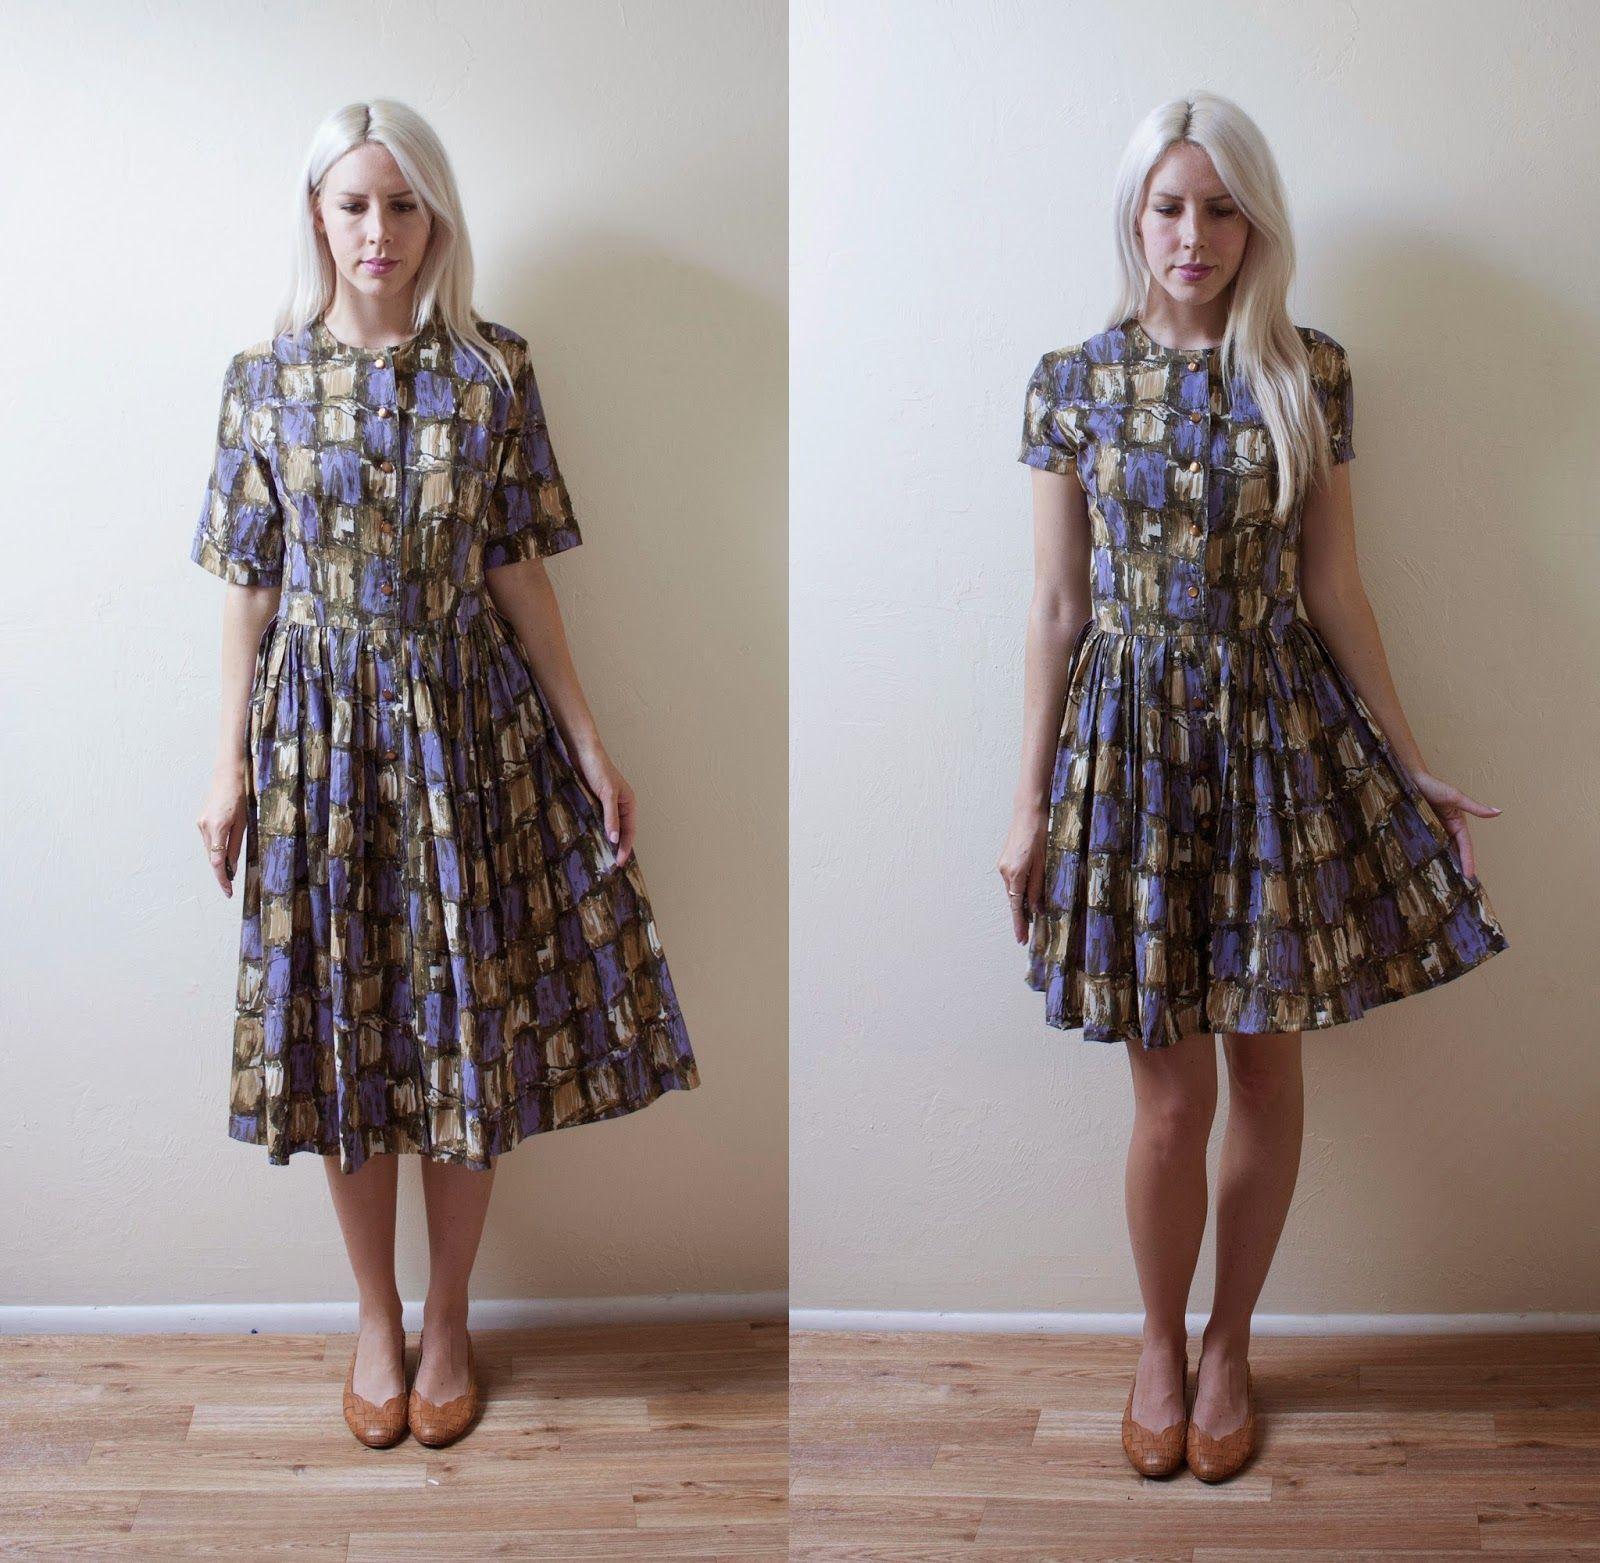 Diy Upcycled Clothing Adaptando A La Moda Moda Facil Pinterest Vintage